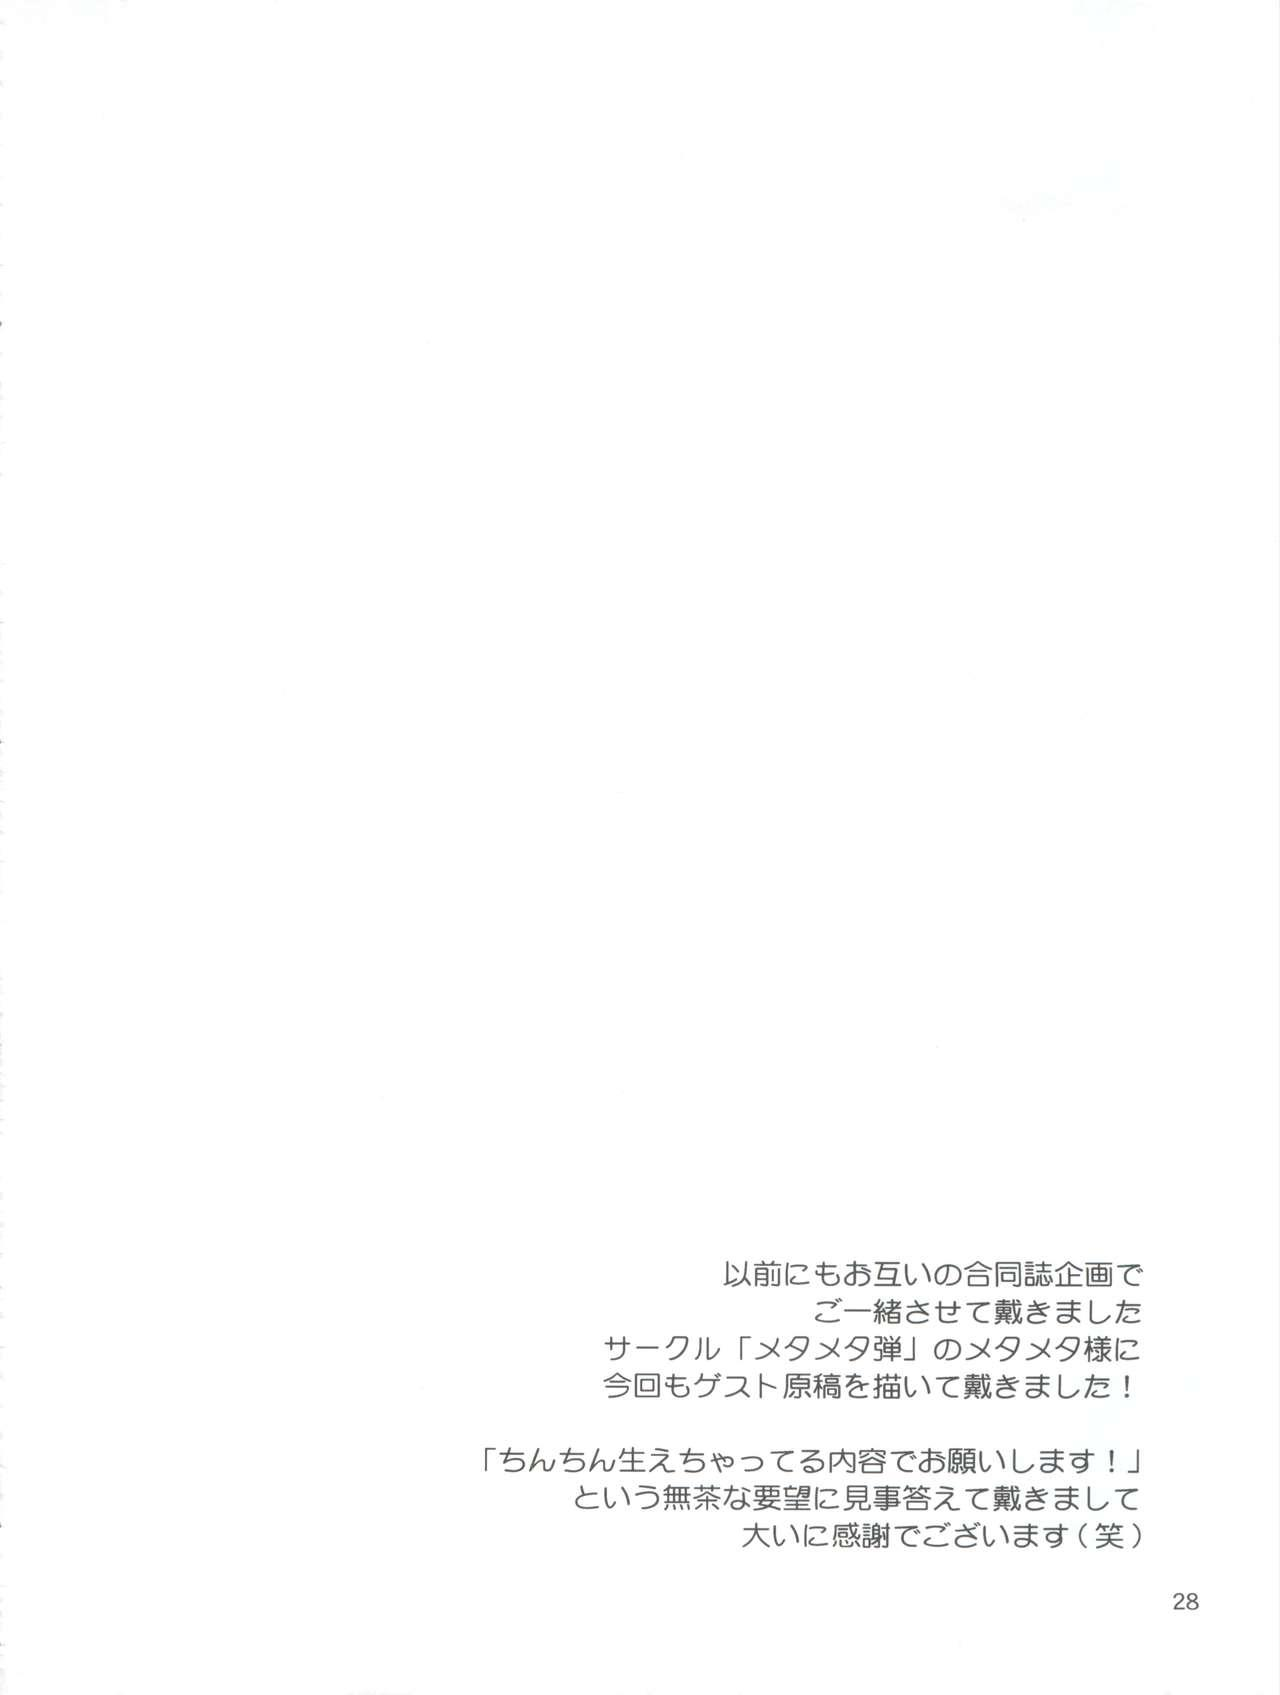 (C93) [Old School Academy (Amedama Akihito)] Fushigi-san no HENTAI ☆ MAHOH Futanari-hen (Creamy Mami, Magical Emi, Pastel Yumi, Magical Fairy Persia, Fancy Lala) 27